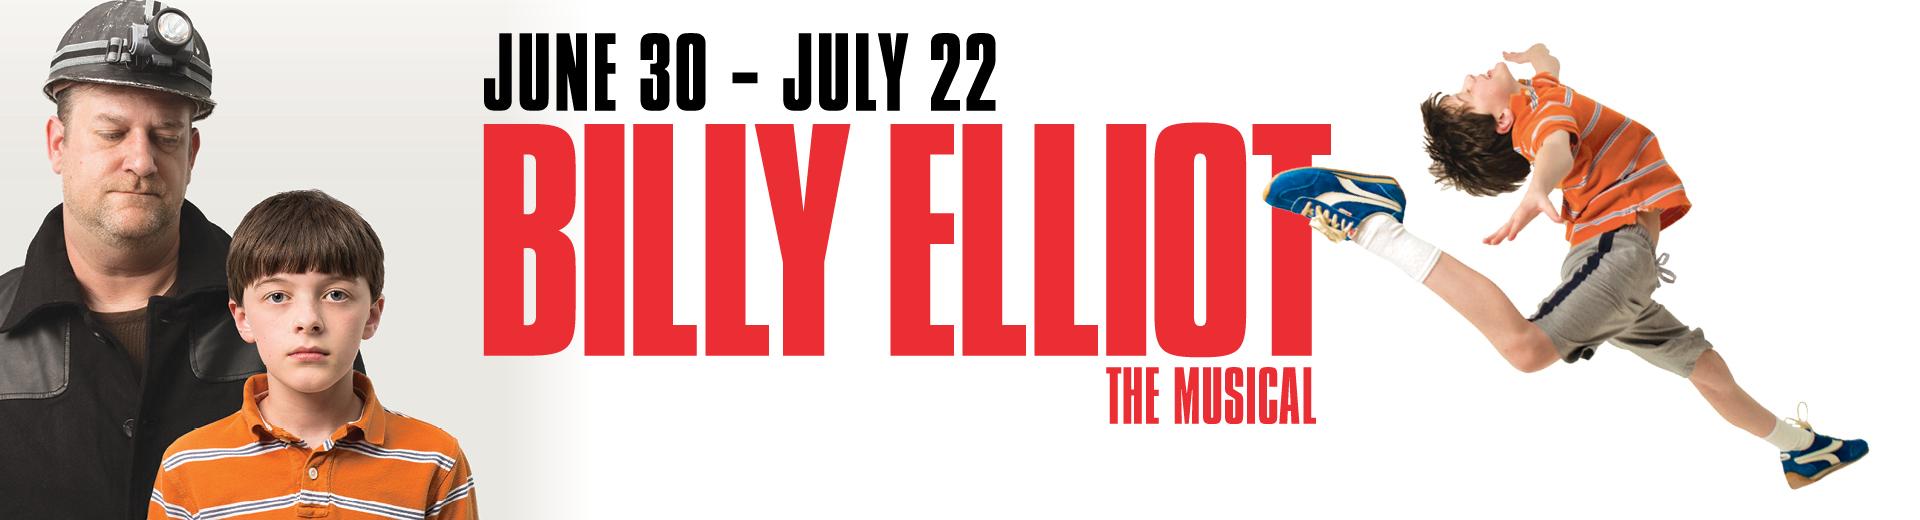 Billy Elliot at TCR